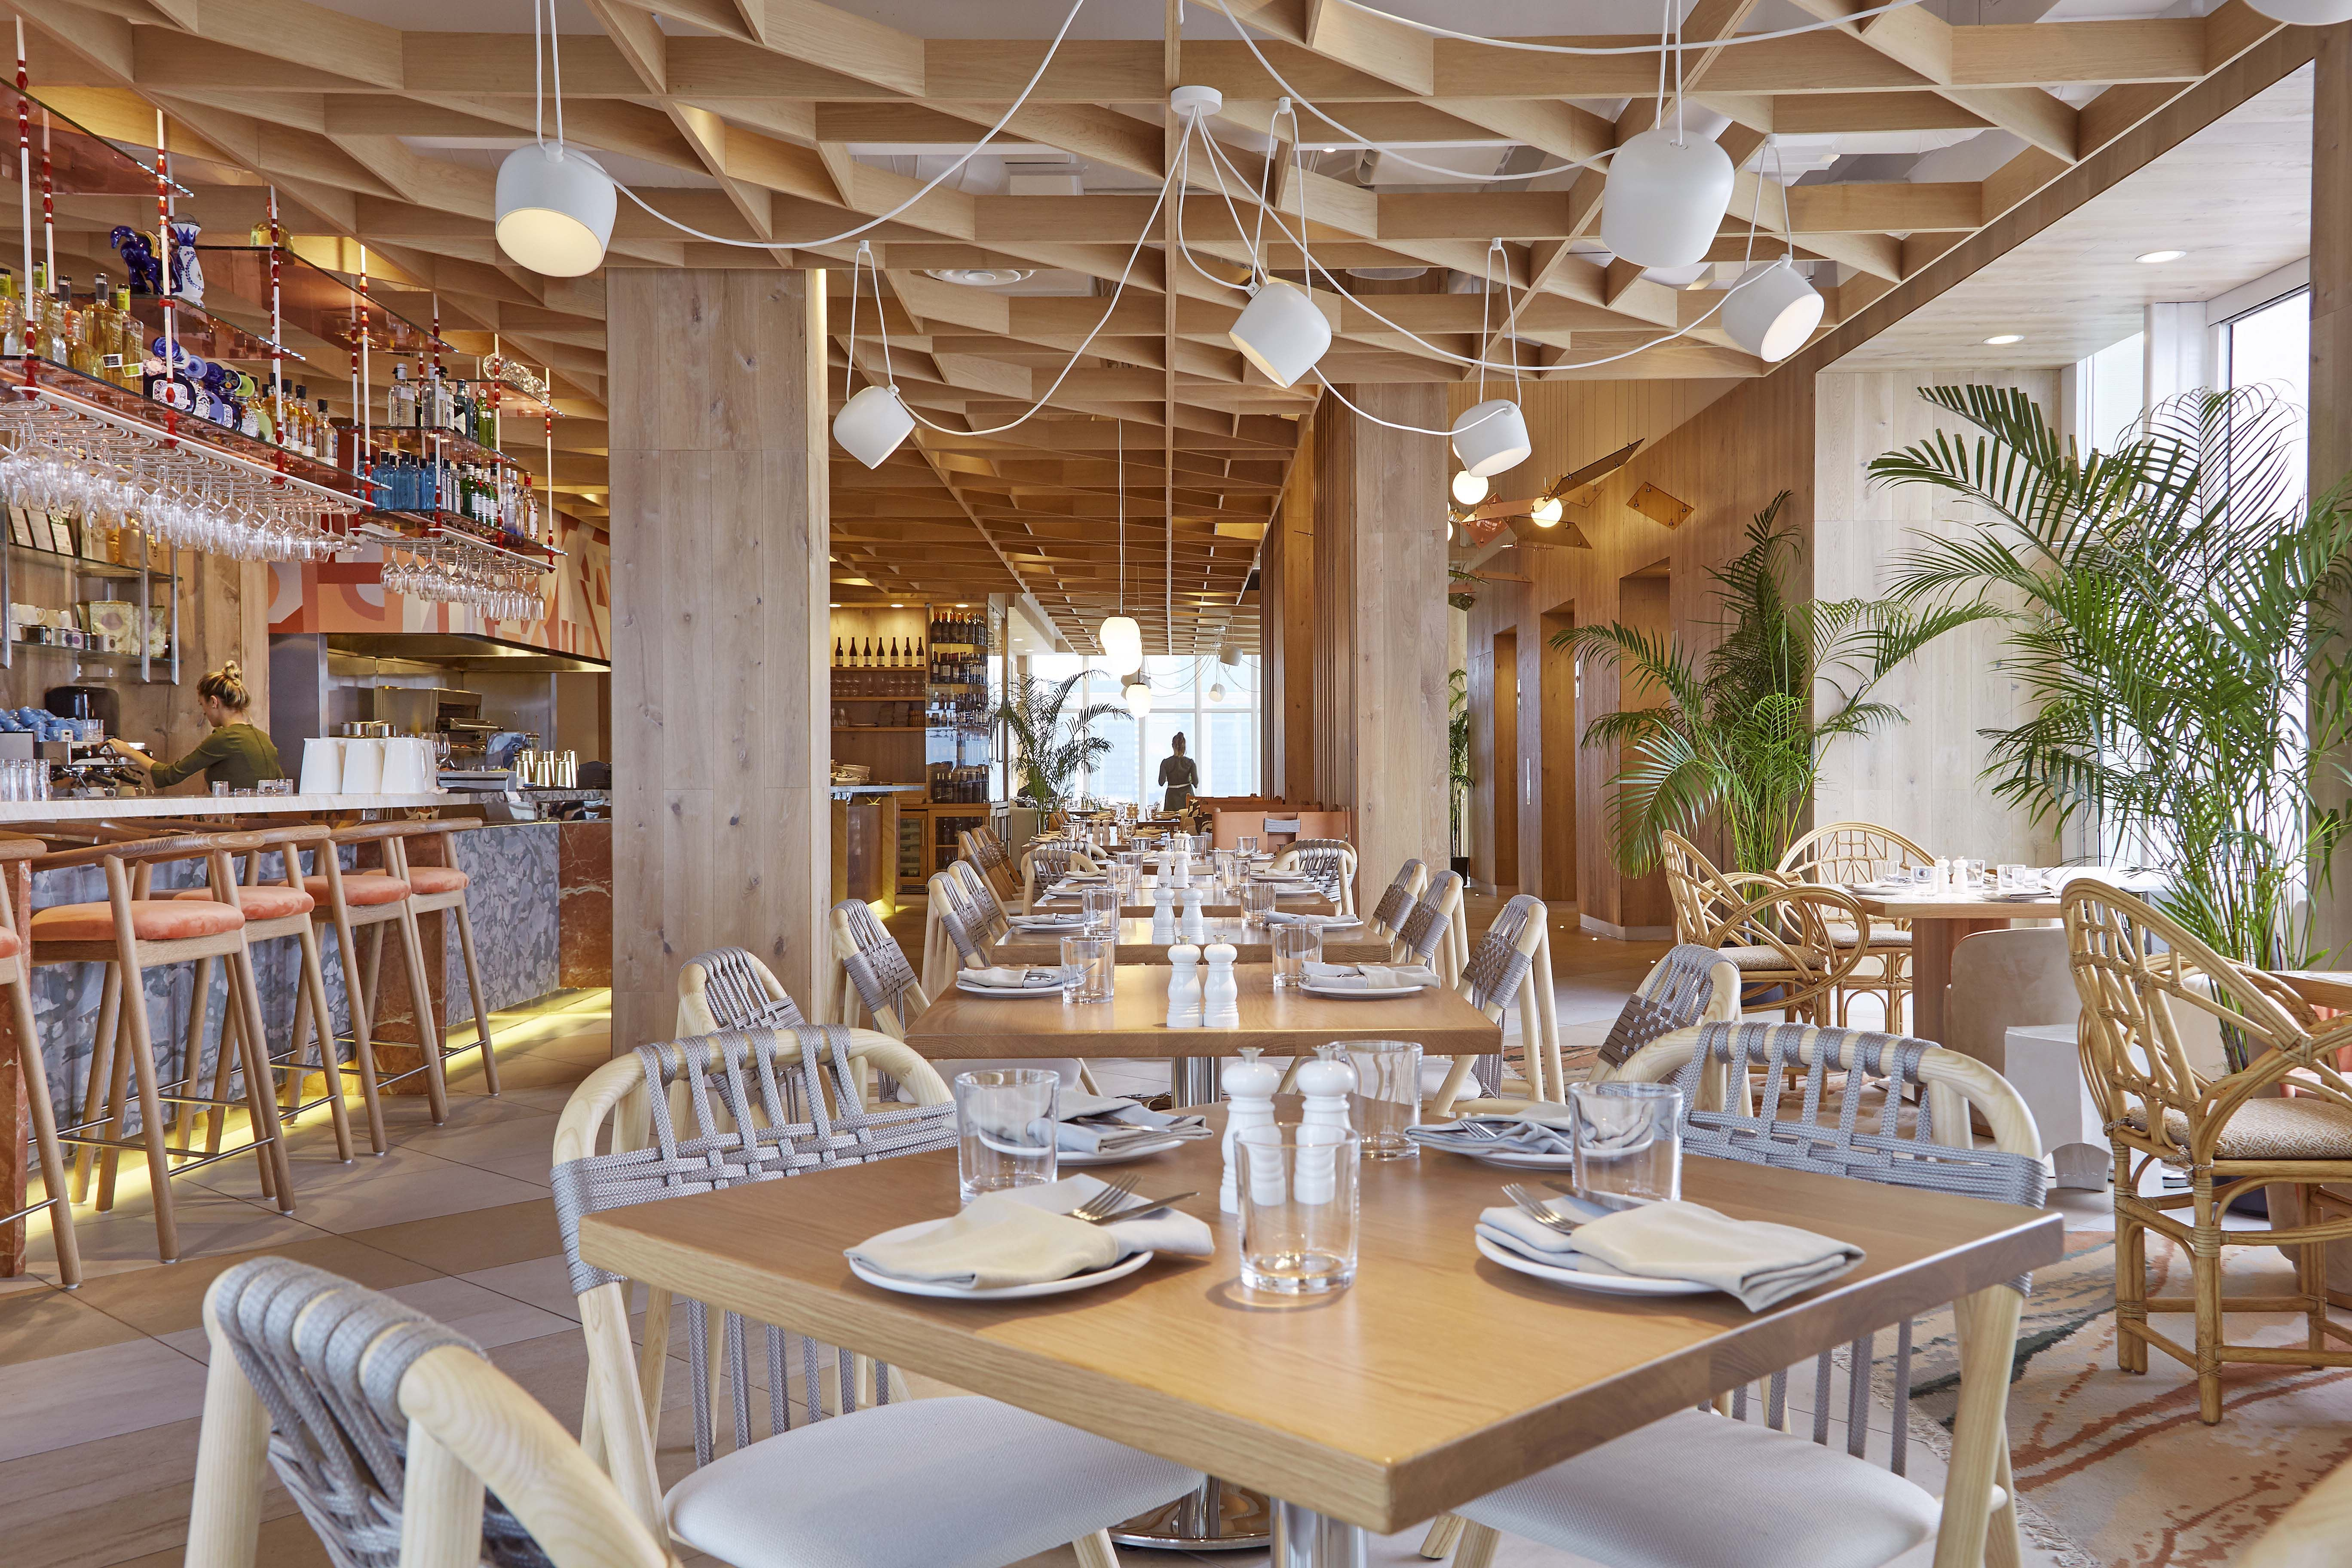 Kost toronto interior design by studio munge be